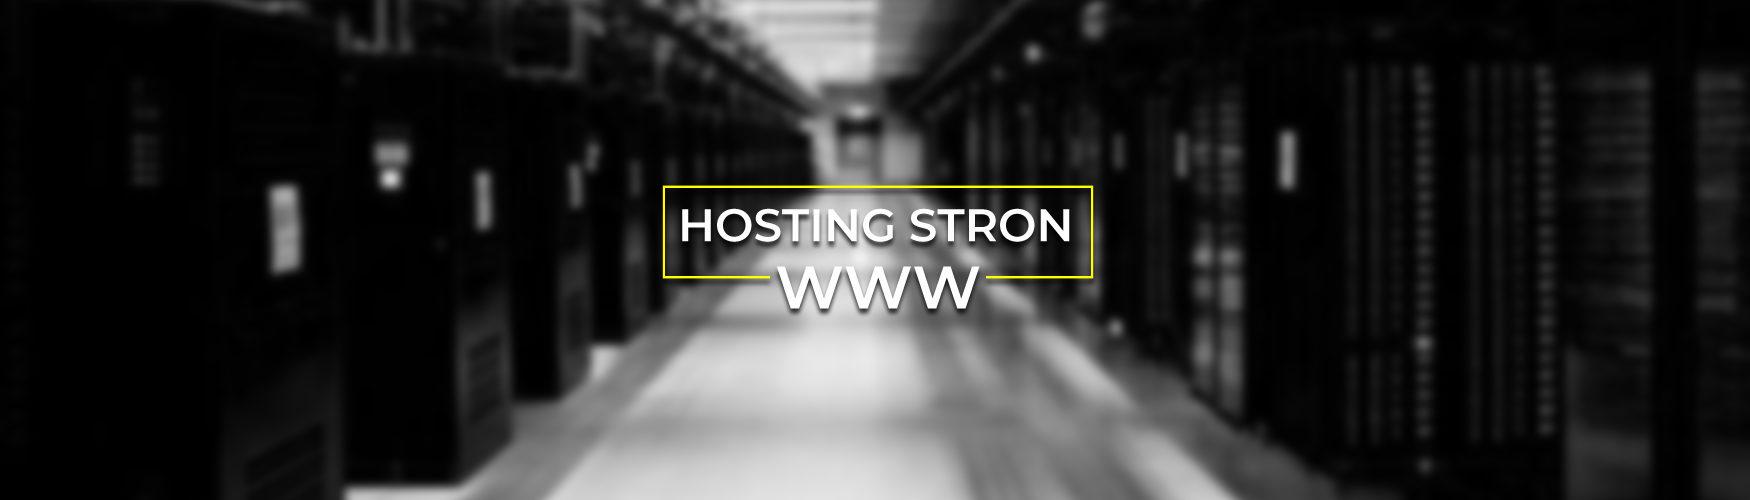 Hosting stron www Slide